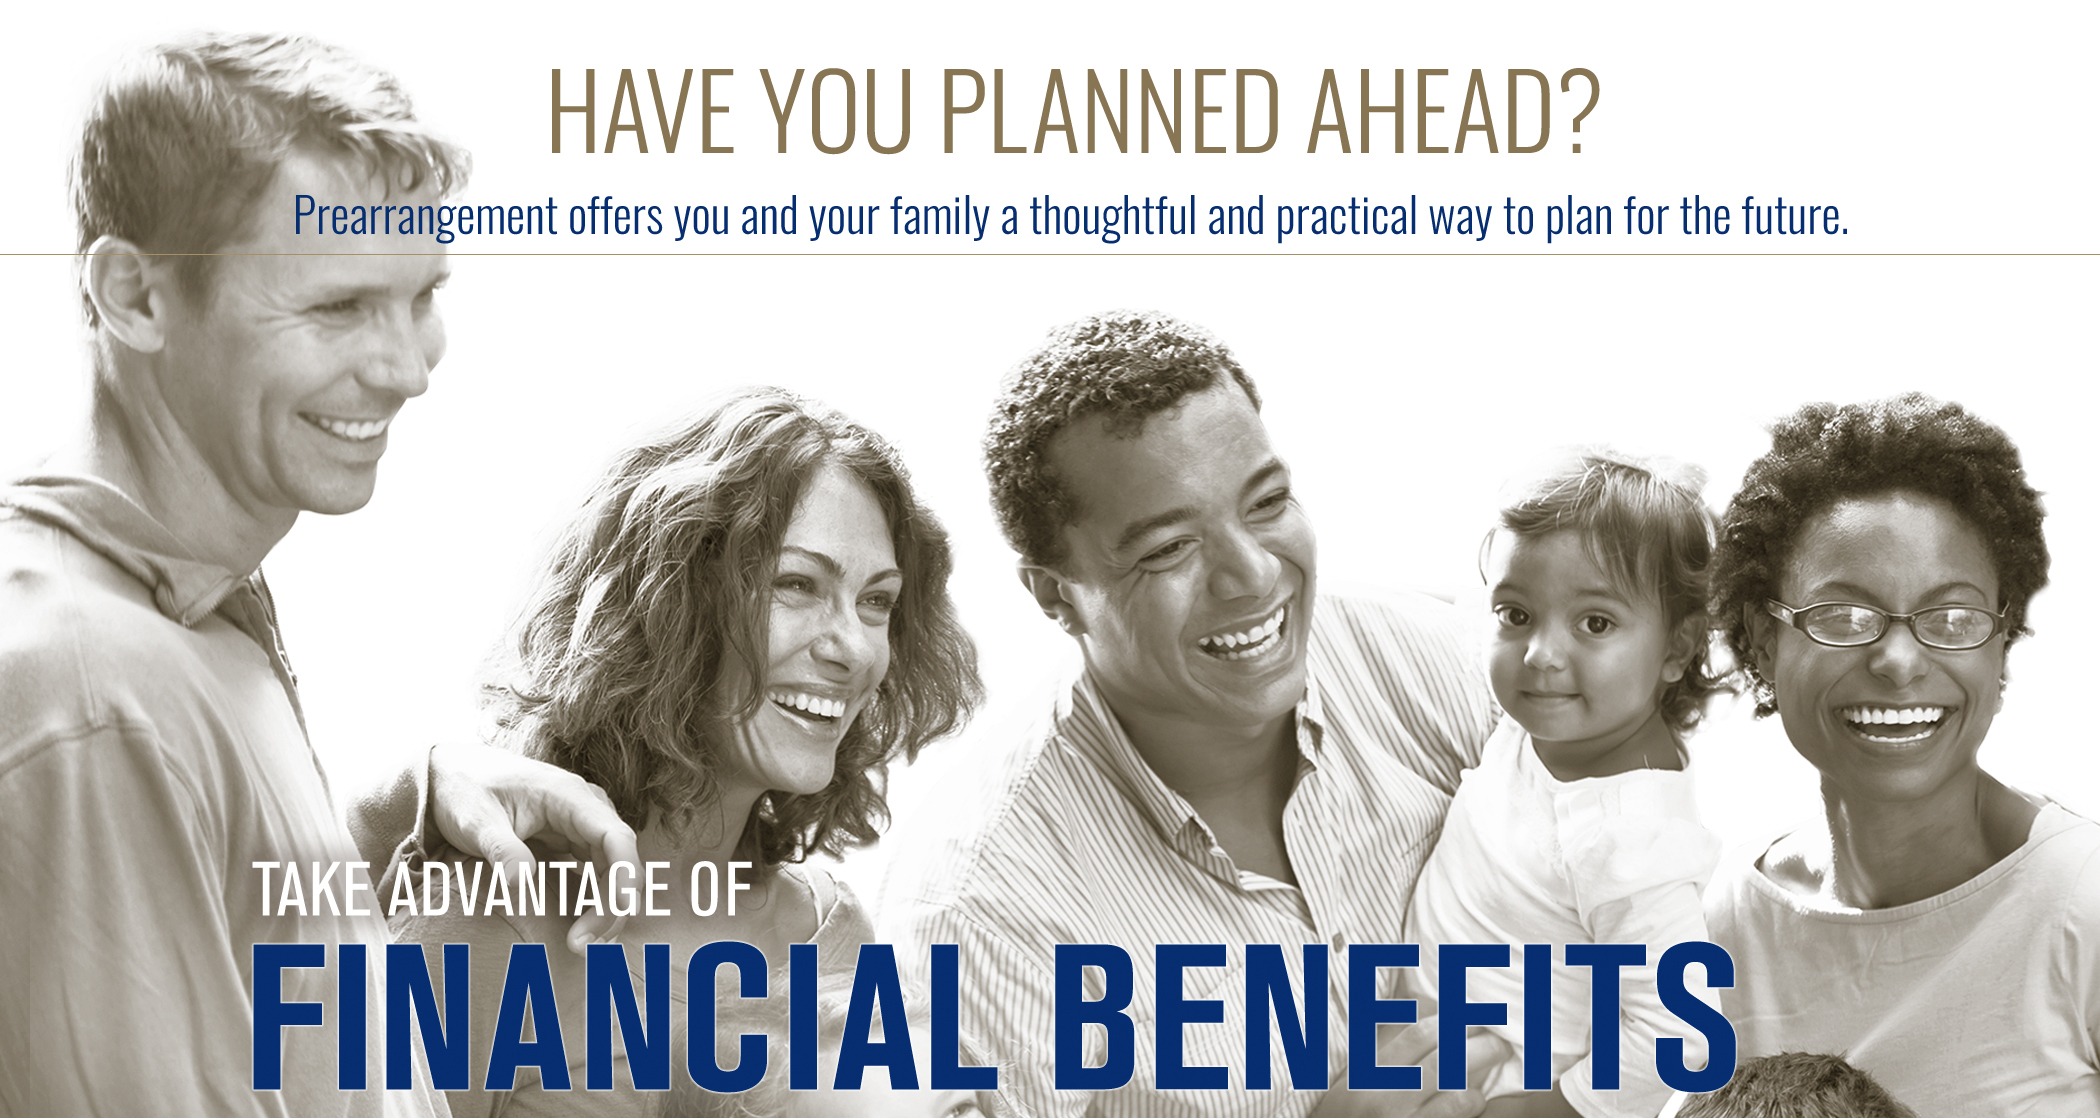 Family1 Take Advantage of Financial Benefits